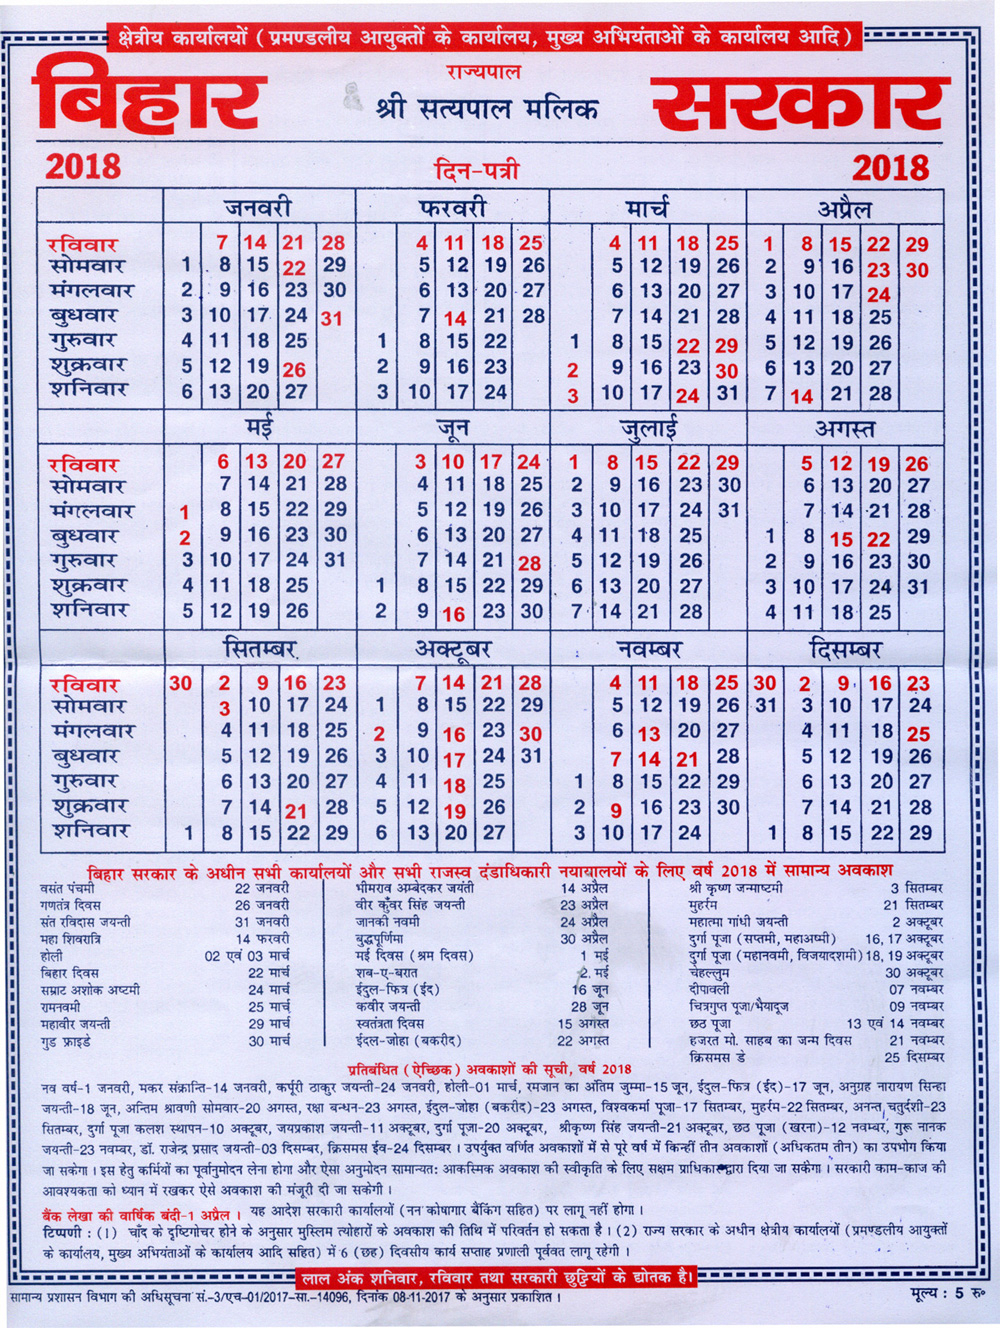 Bihar Government Holiday Calendar 2020 | Calendar For Planning within Bihar Government Calander